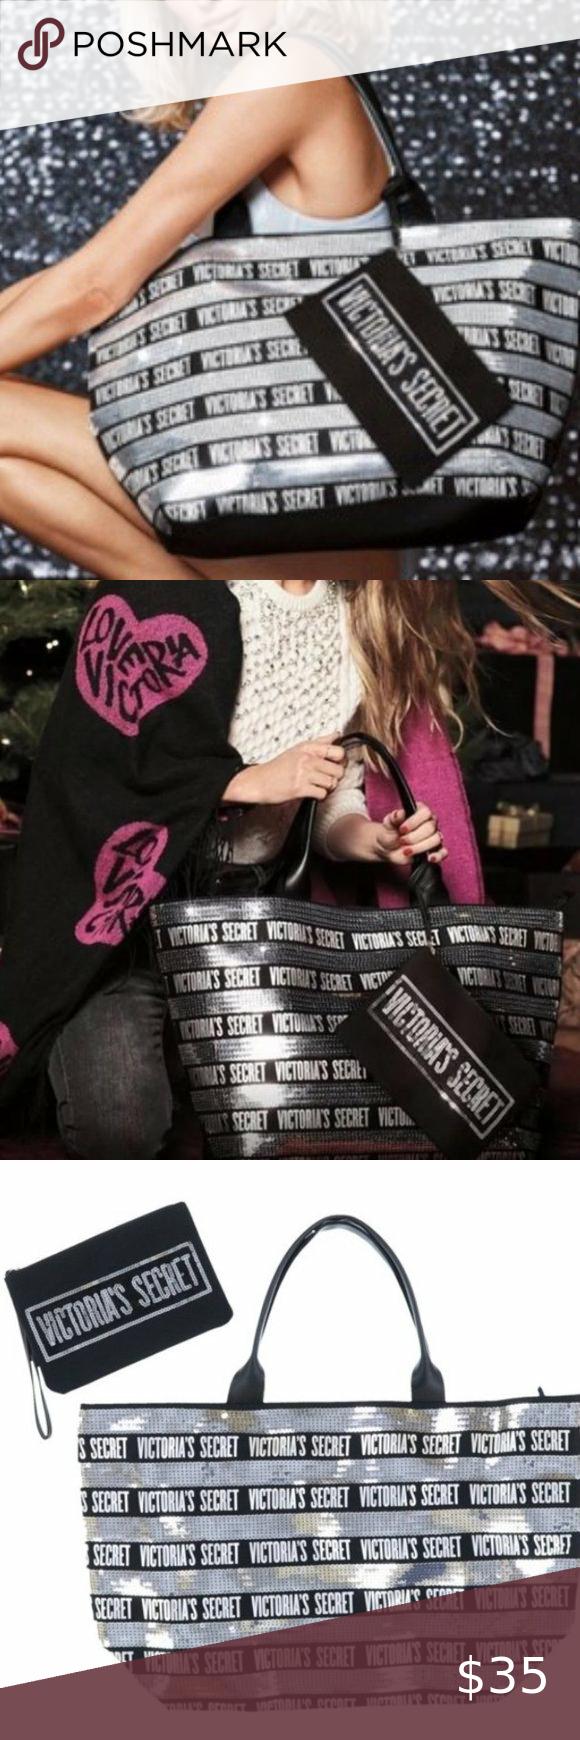 Victoria S Secret 2018 Black Friday Tote Set Nwt In 2020 Victoria Secret Victoria Secret Tote Bags Victoria Secret Tote